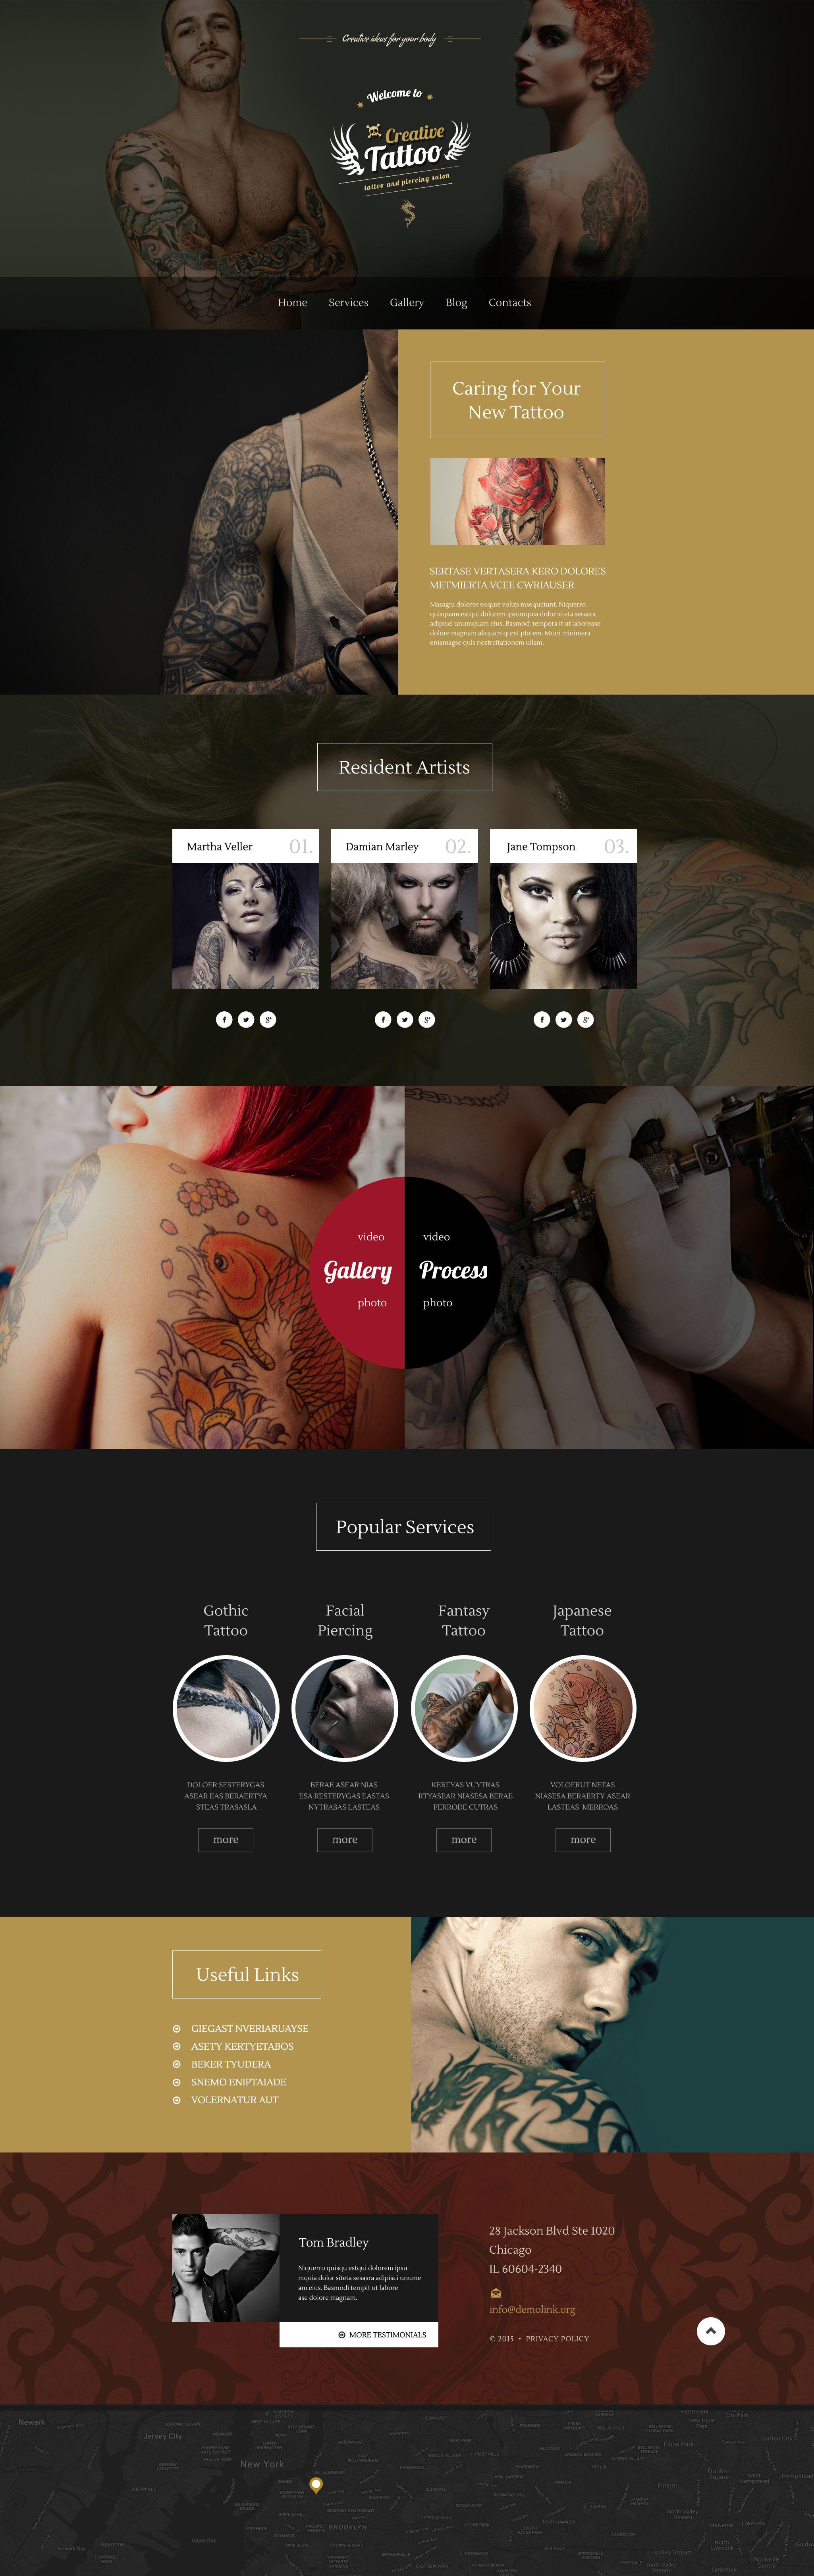 """Creative Tattoo"" 响应式WordPress模板 #55046 - 截图"